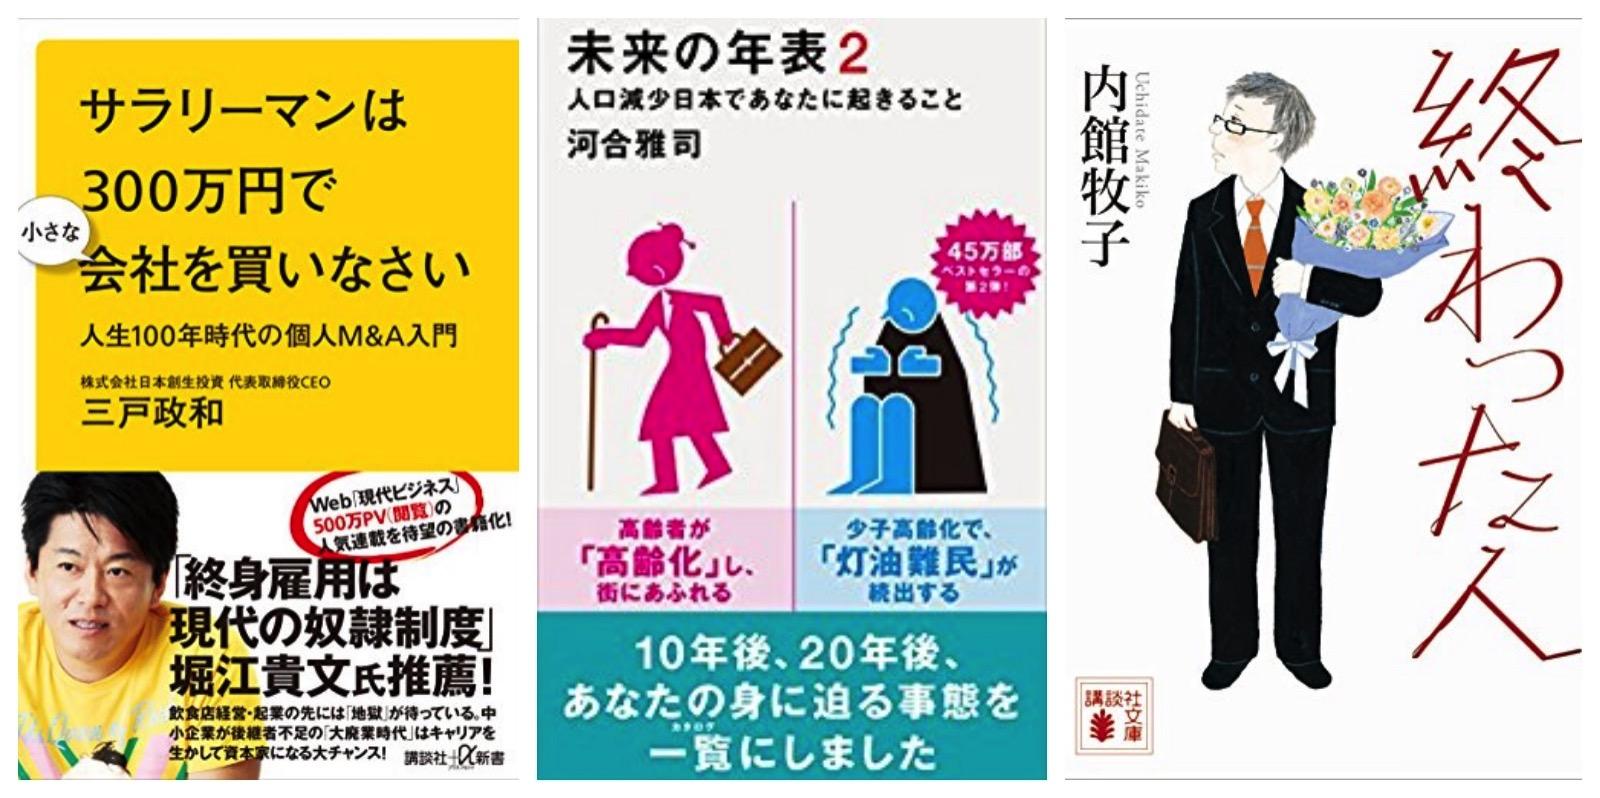 Kodansha Campaign Kindle